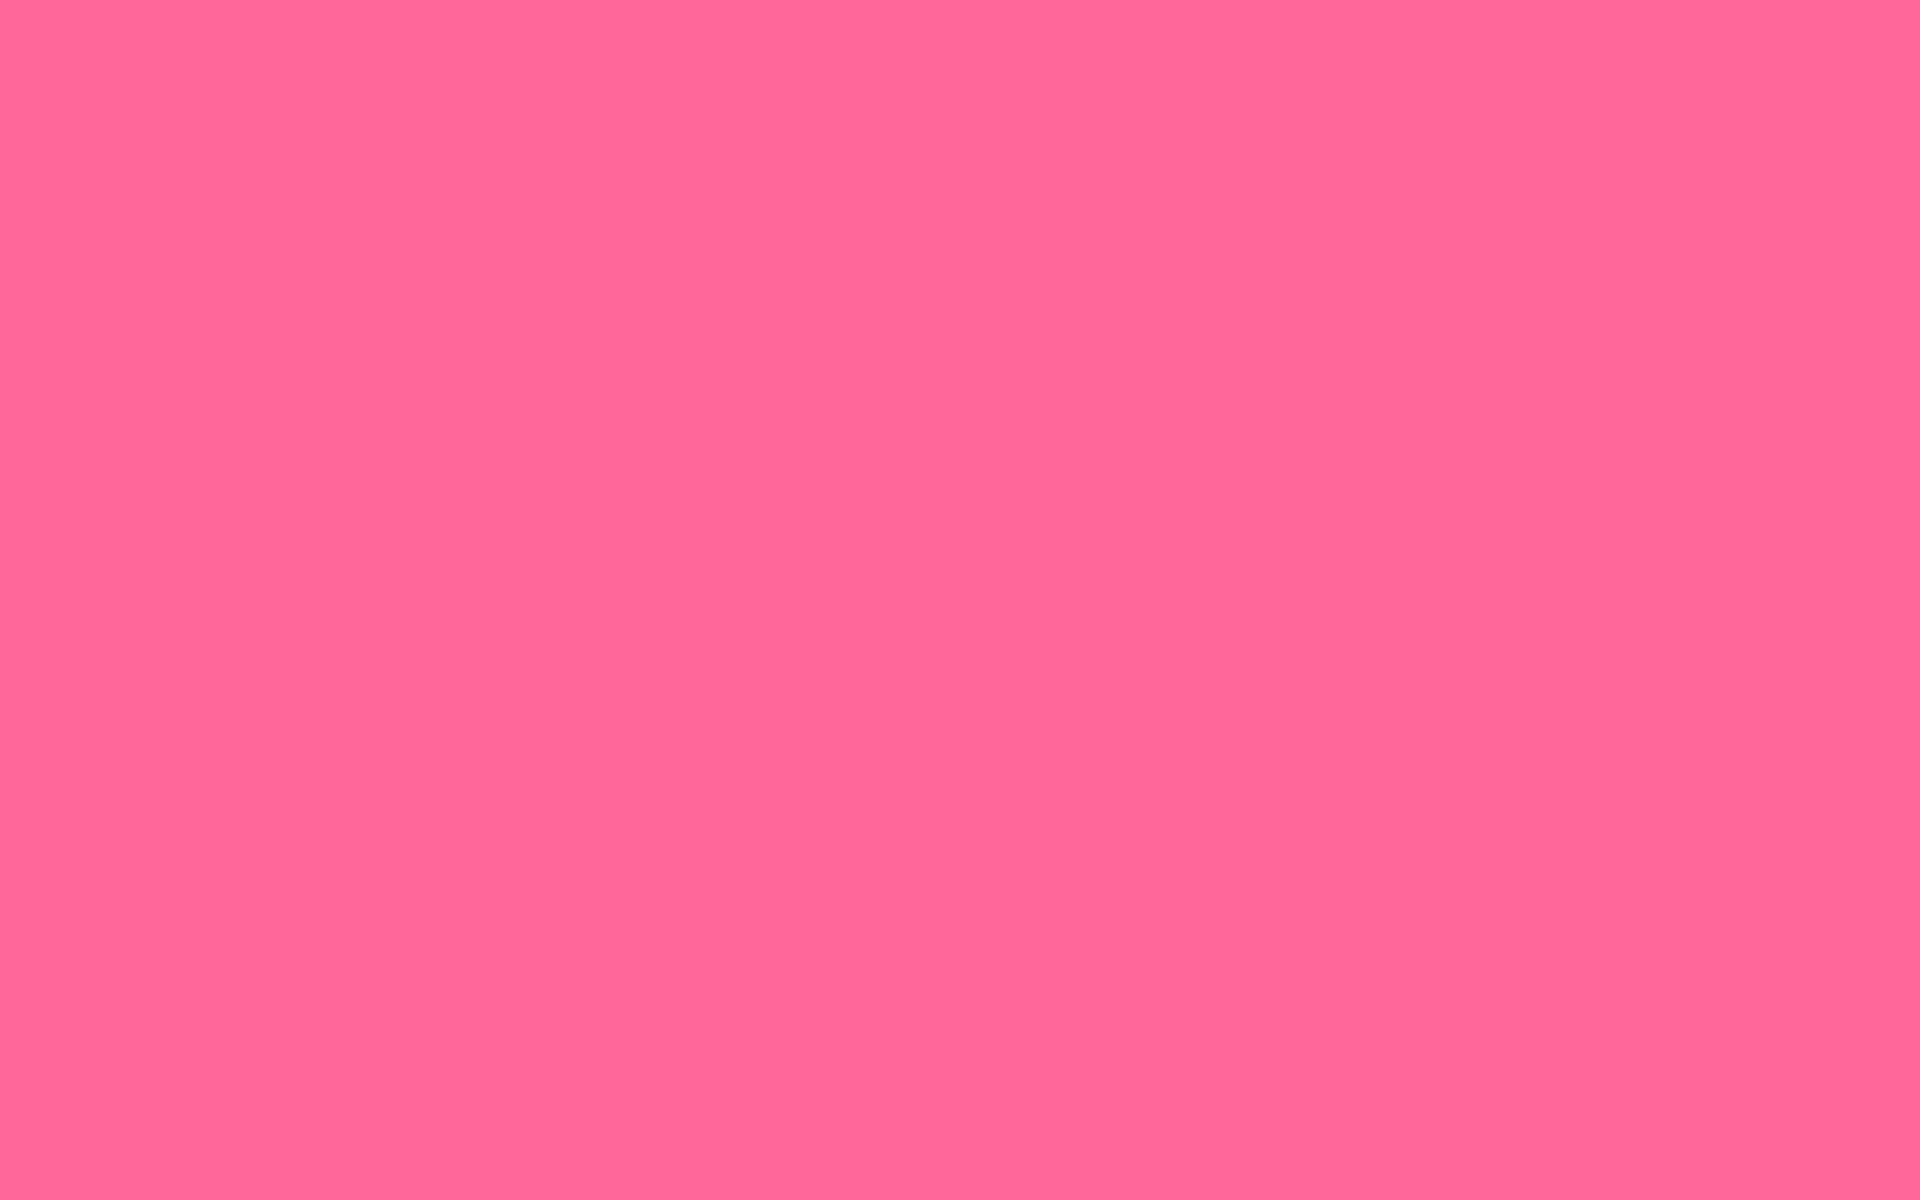 ČSNS - barva